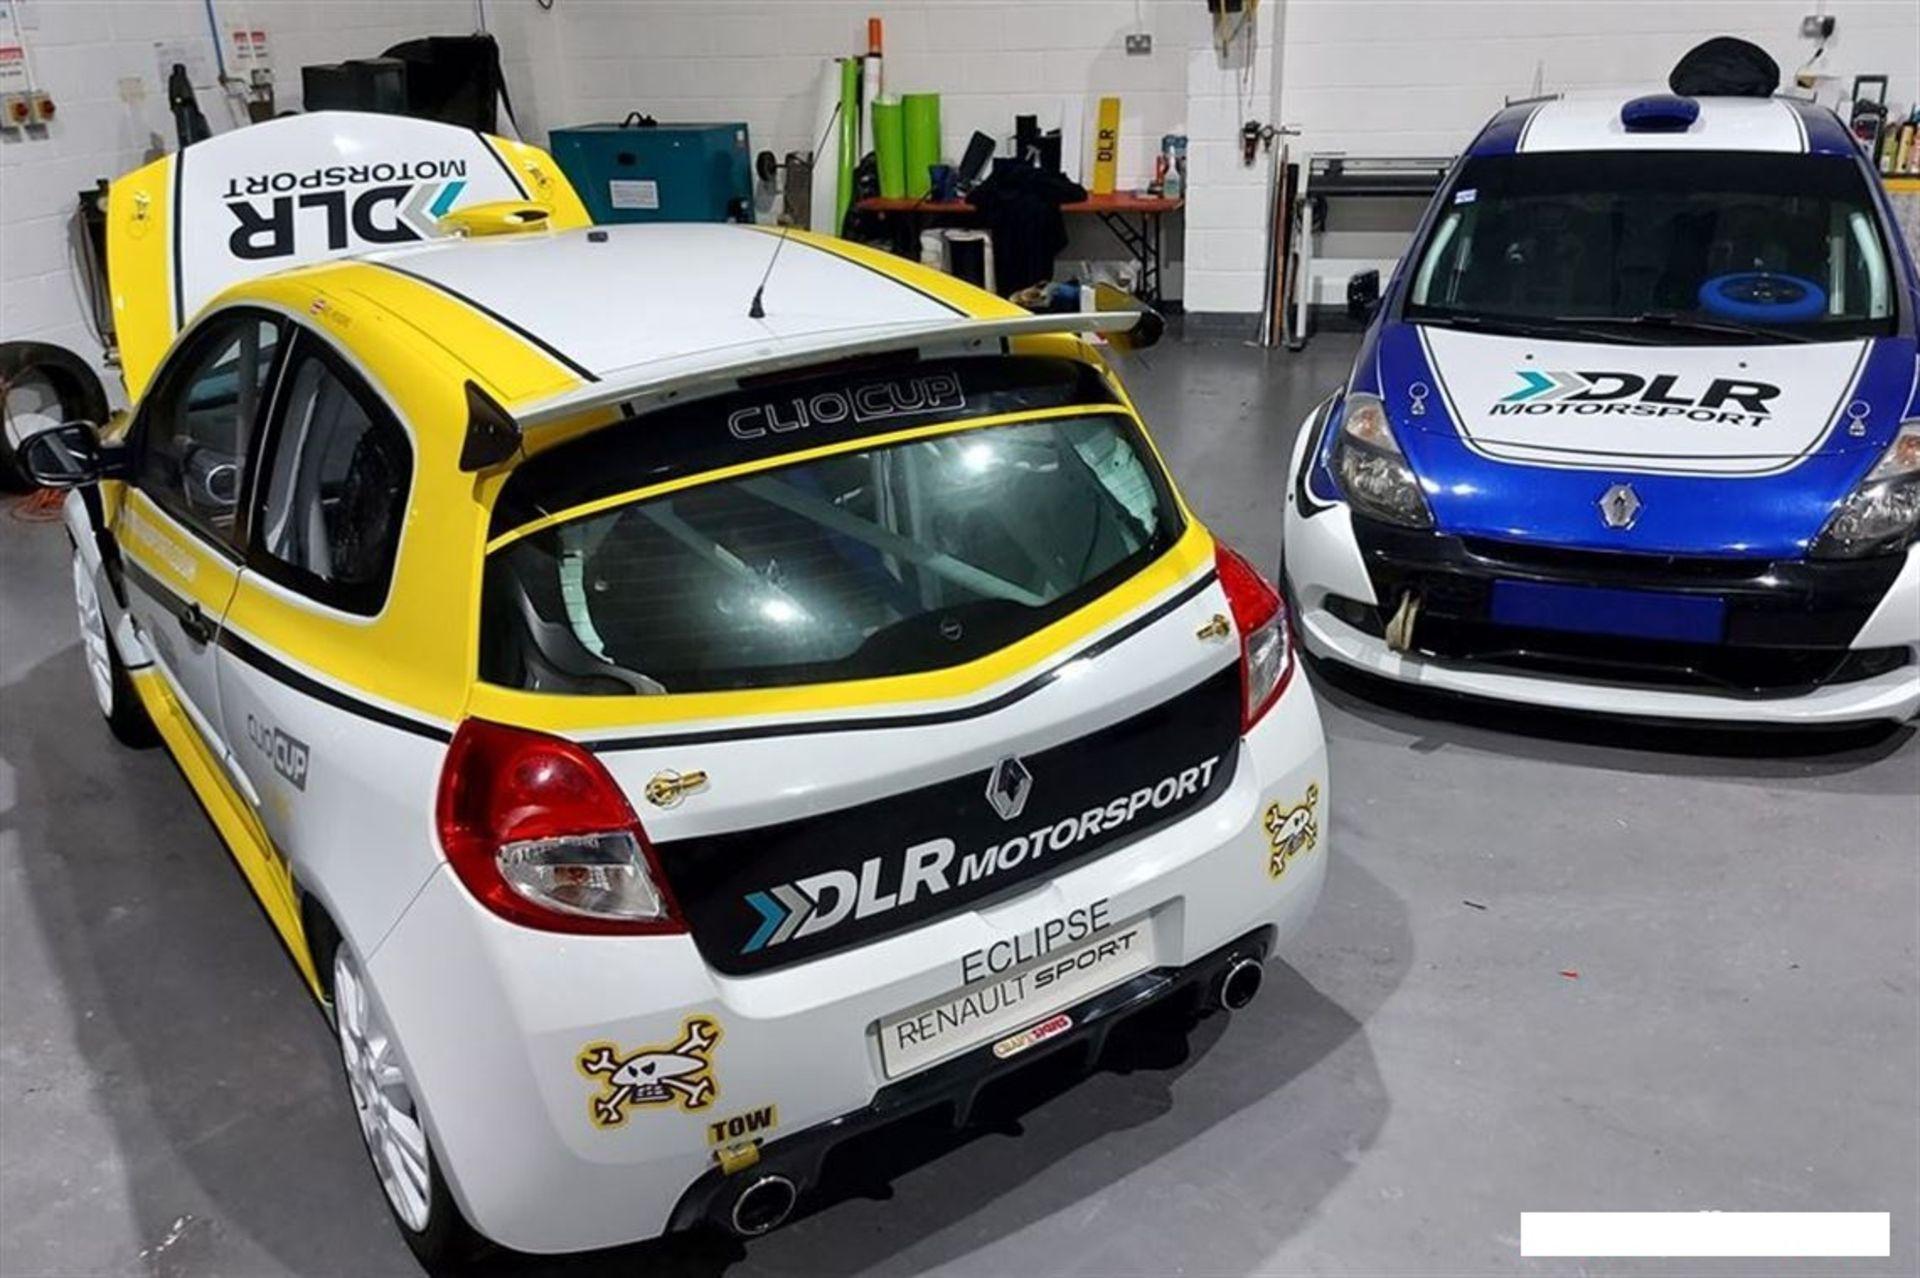 CLIO CUP X85 RHD SADEV ON PADDLES RACE CAR - Image 2 of 4